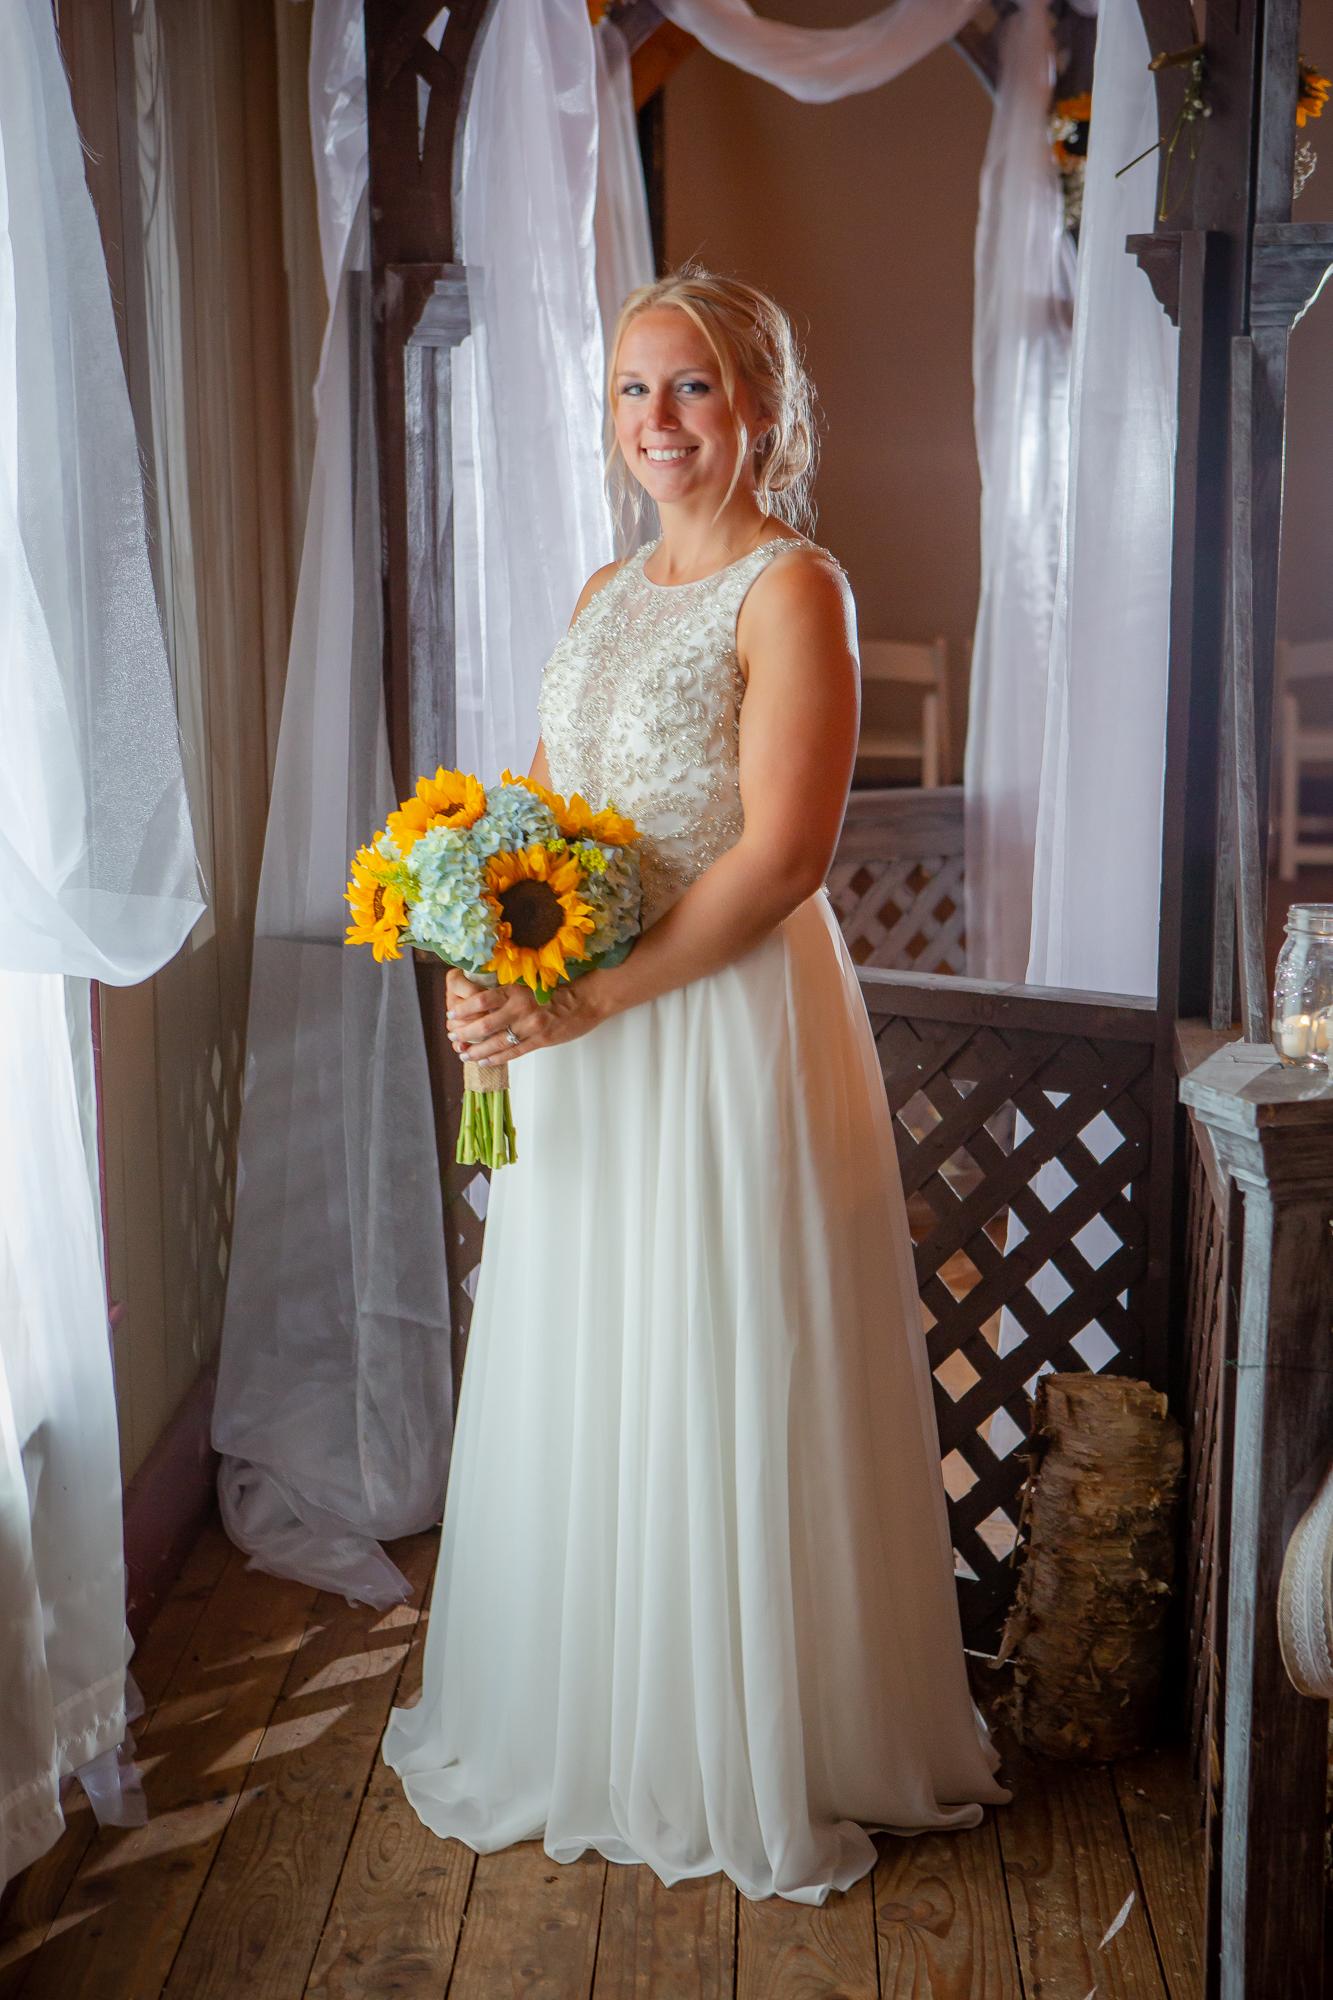 Wedding-Carriage-House-Oneonta-NY-0825.jpg